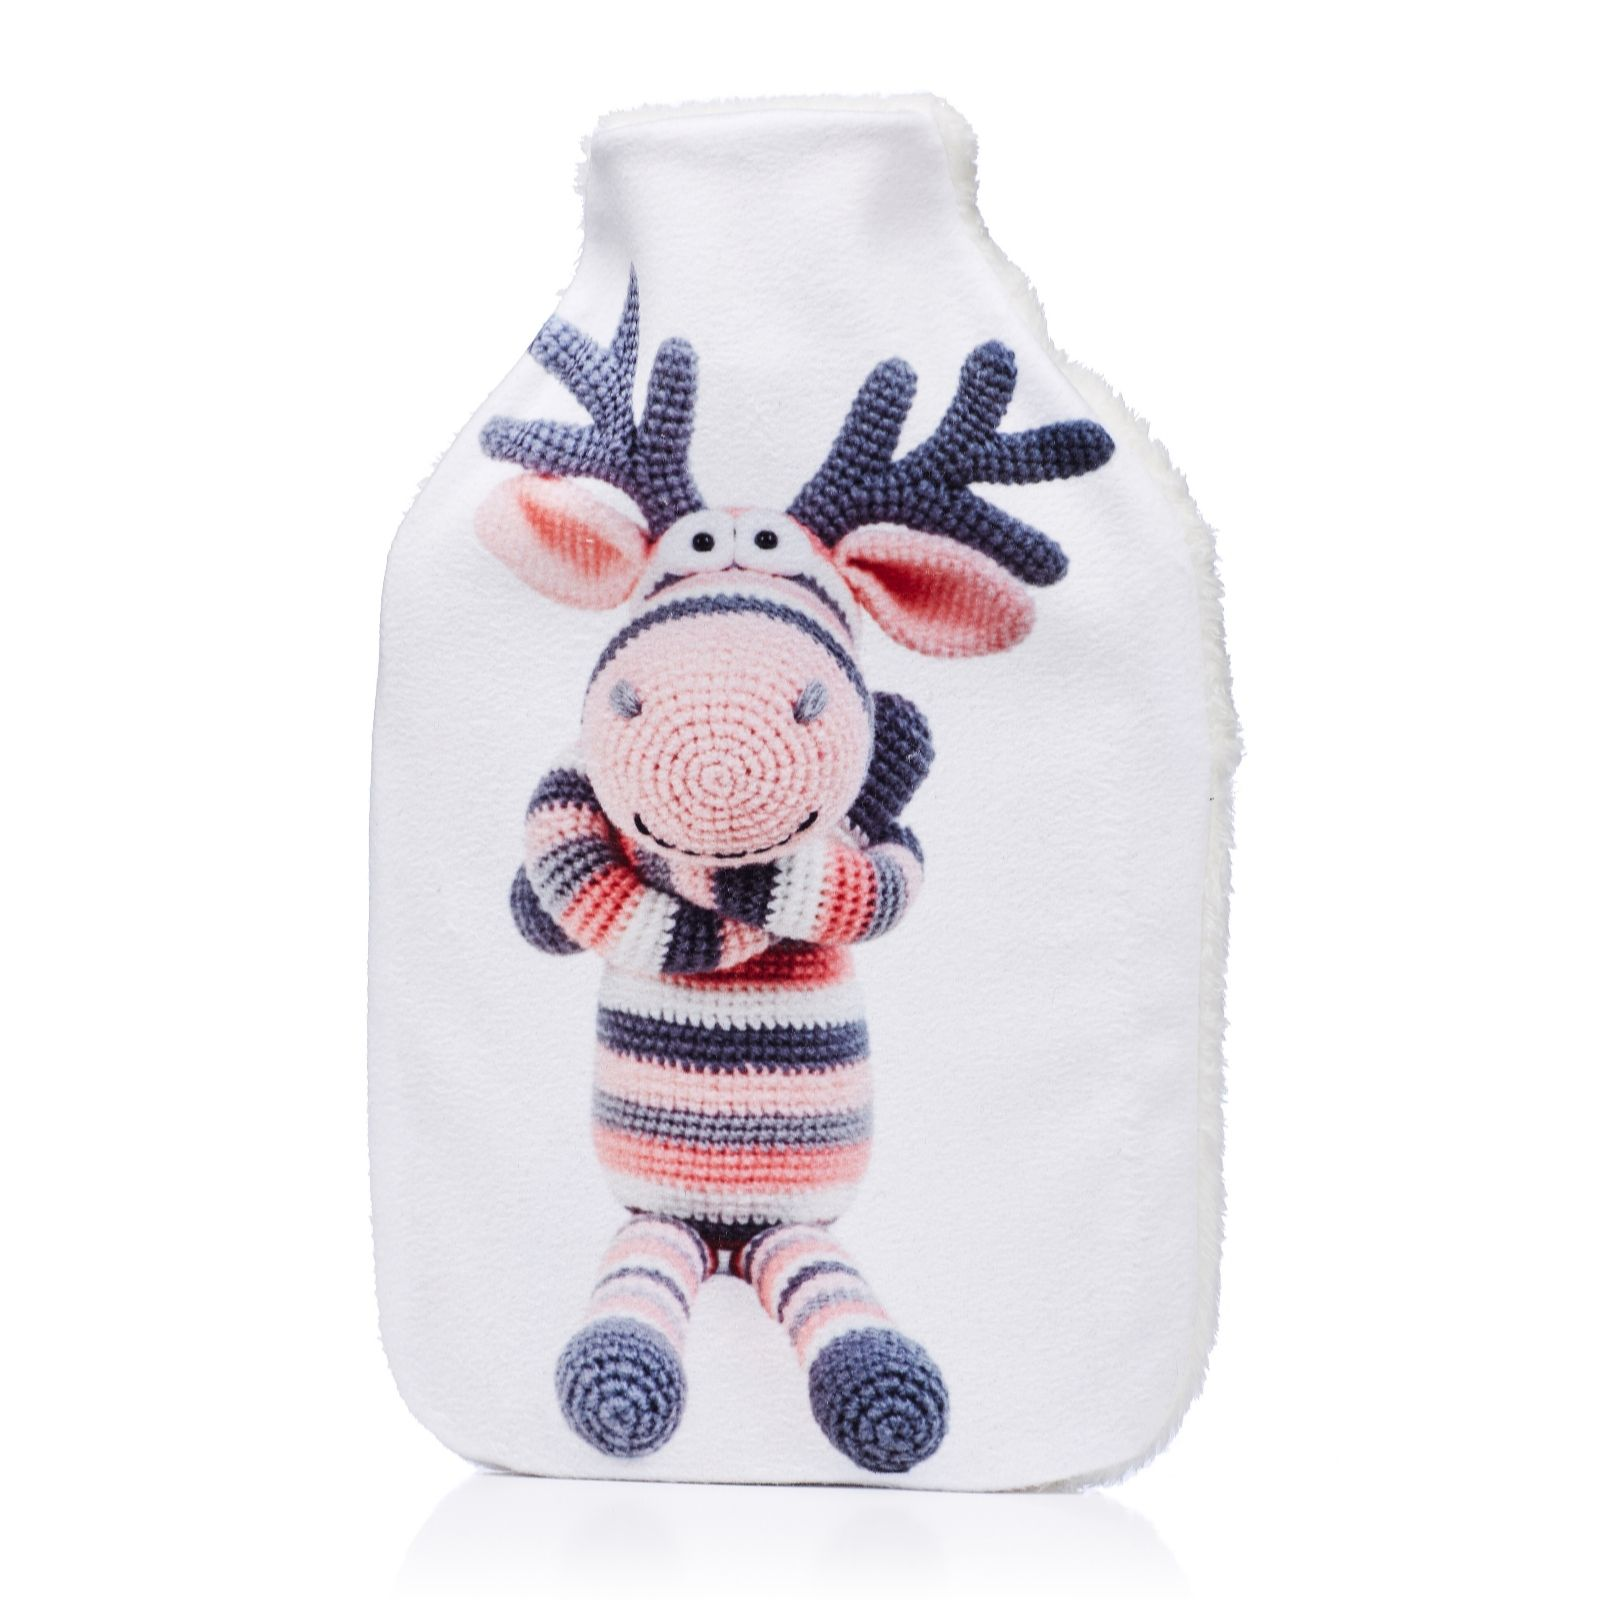 ee9f27ef595f Vagabond 2 Litre Hot Water Bottle Animal Friends - QVC UK